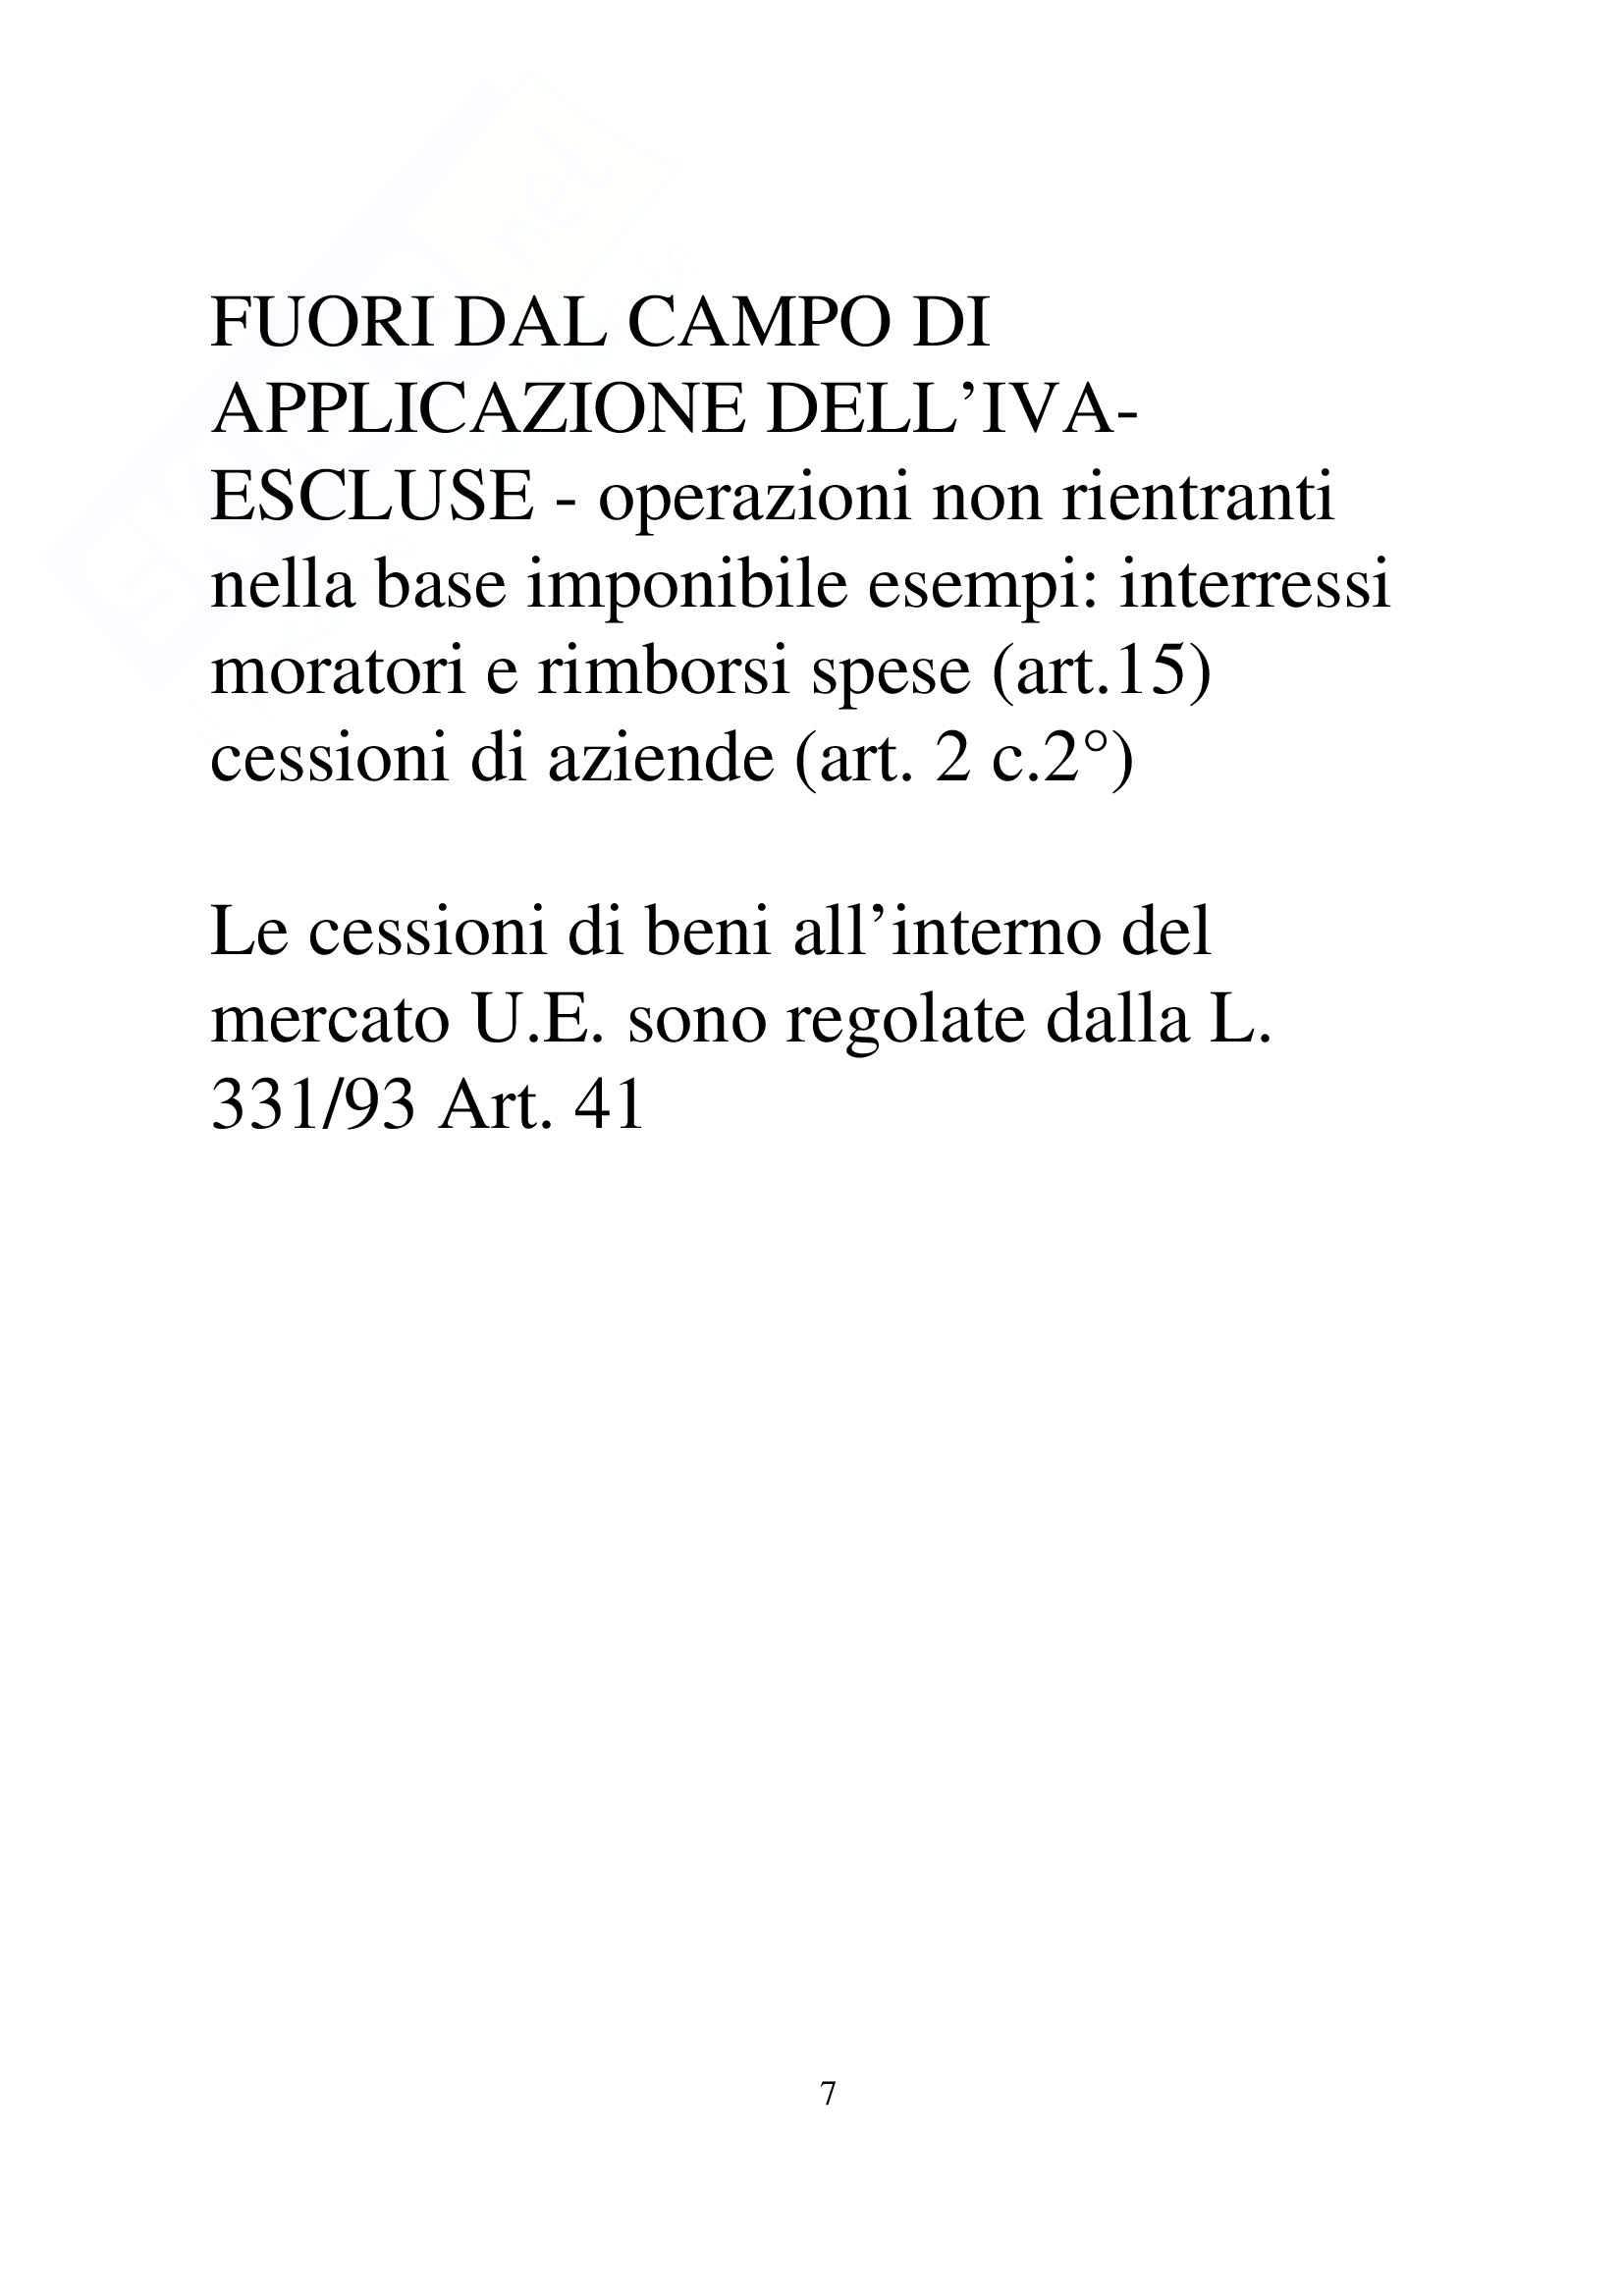 Diritto tributario -  Seminario Iva - Appunti Pag. 6